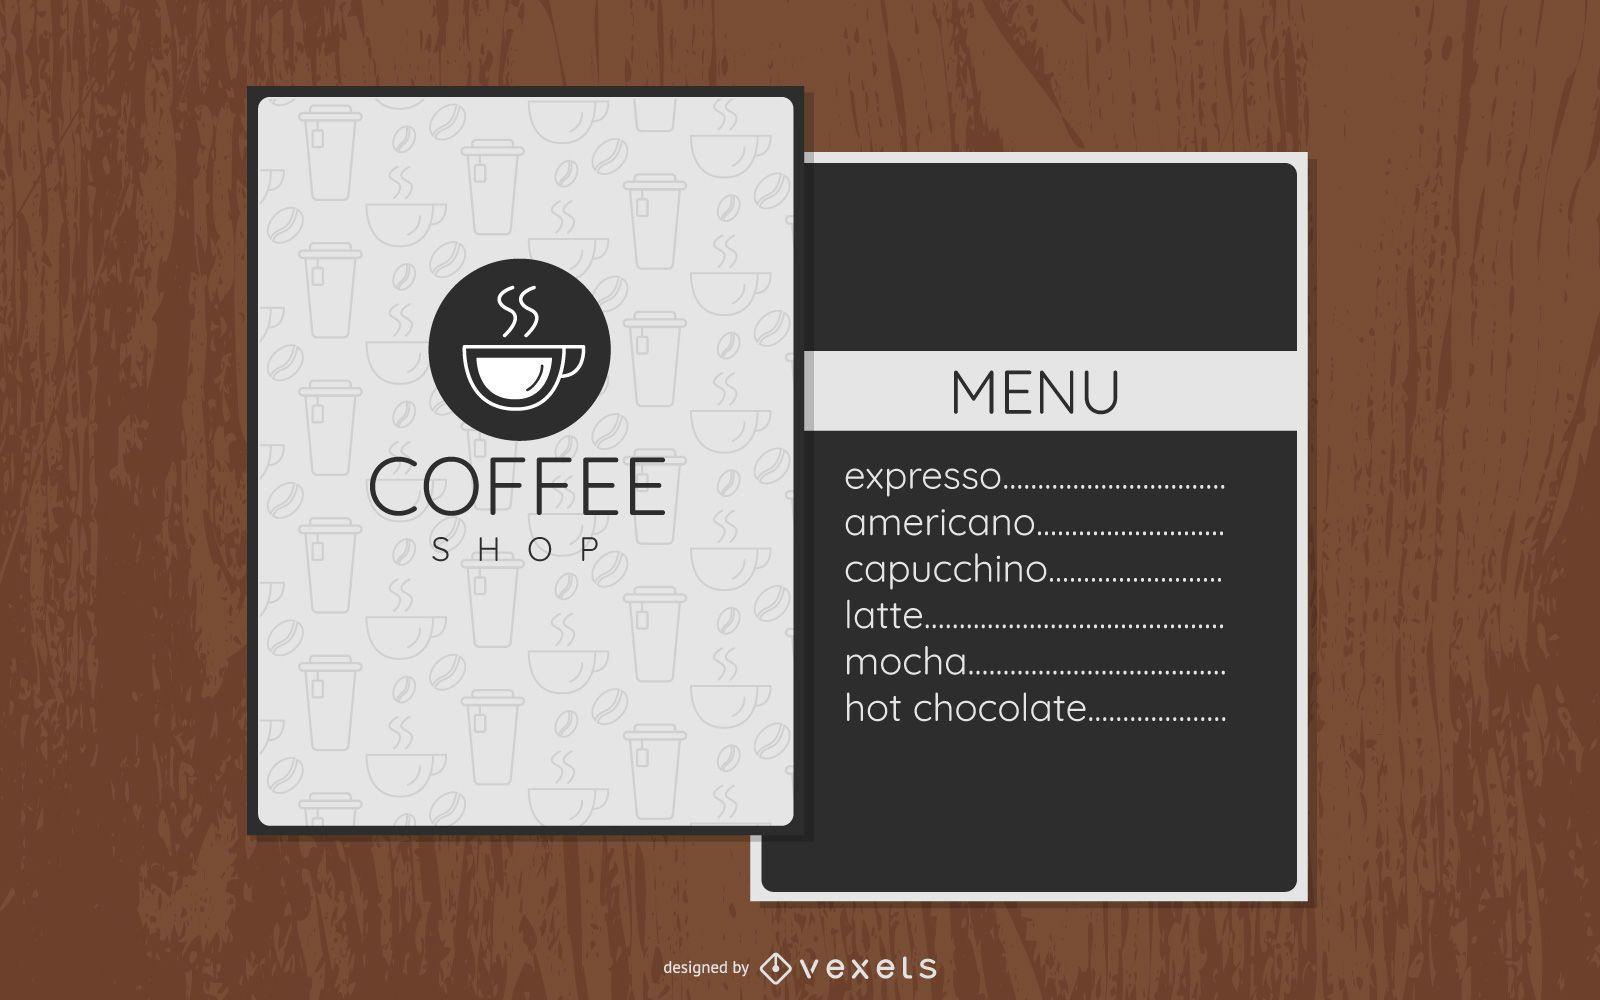 Coffee Shop Minimalistic Menu Design